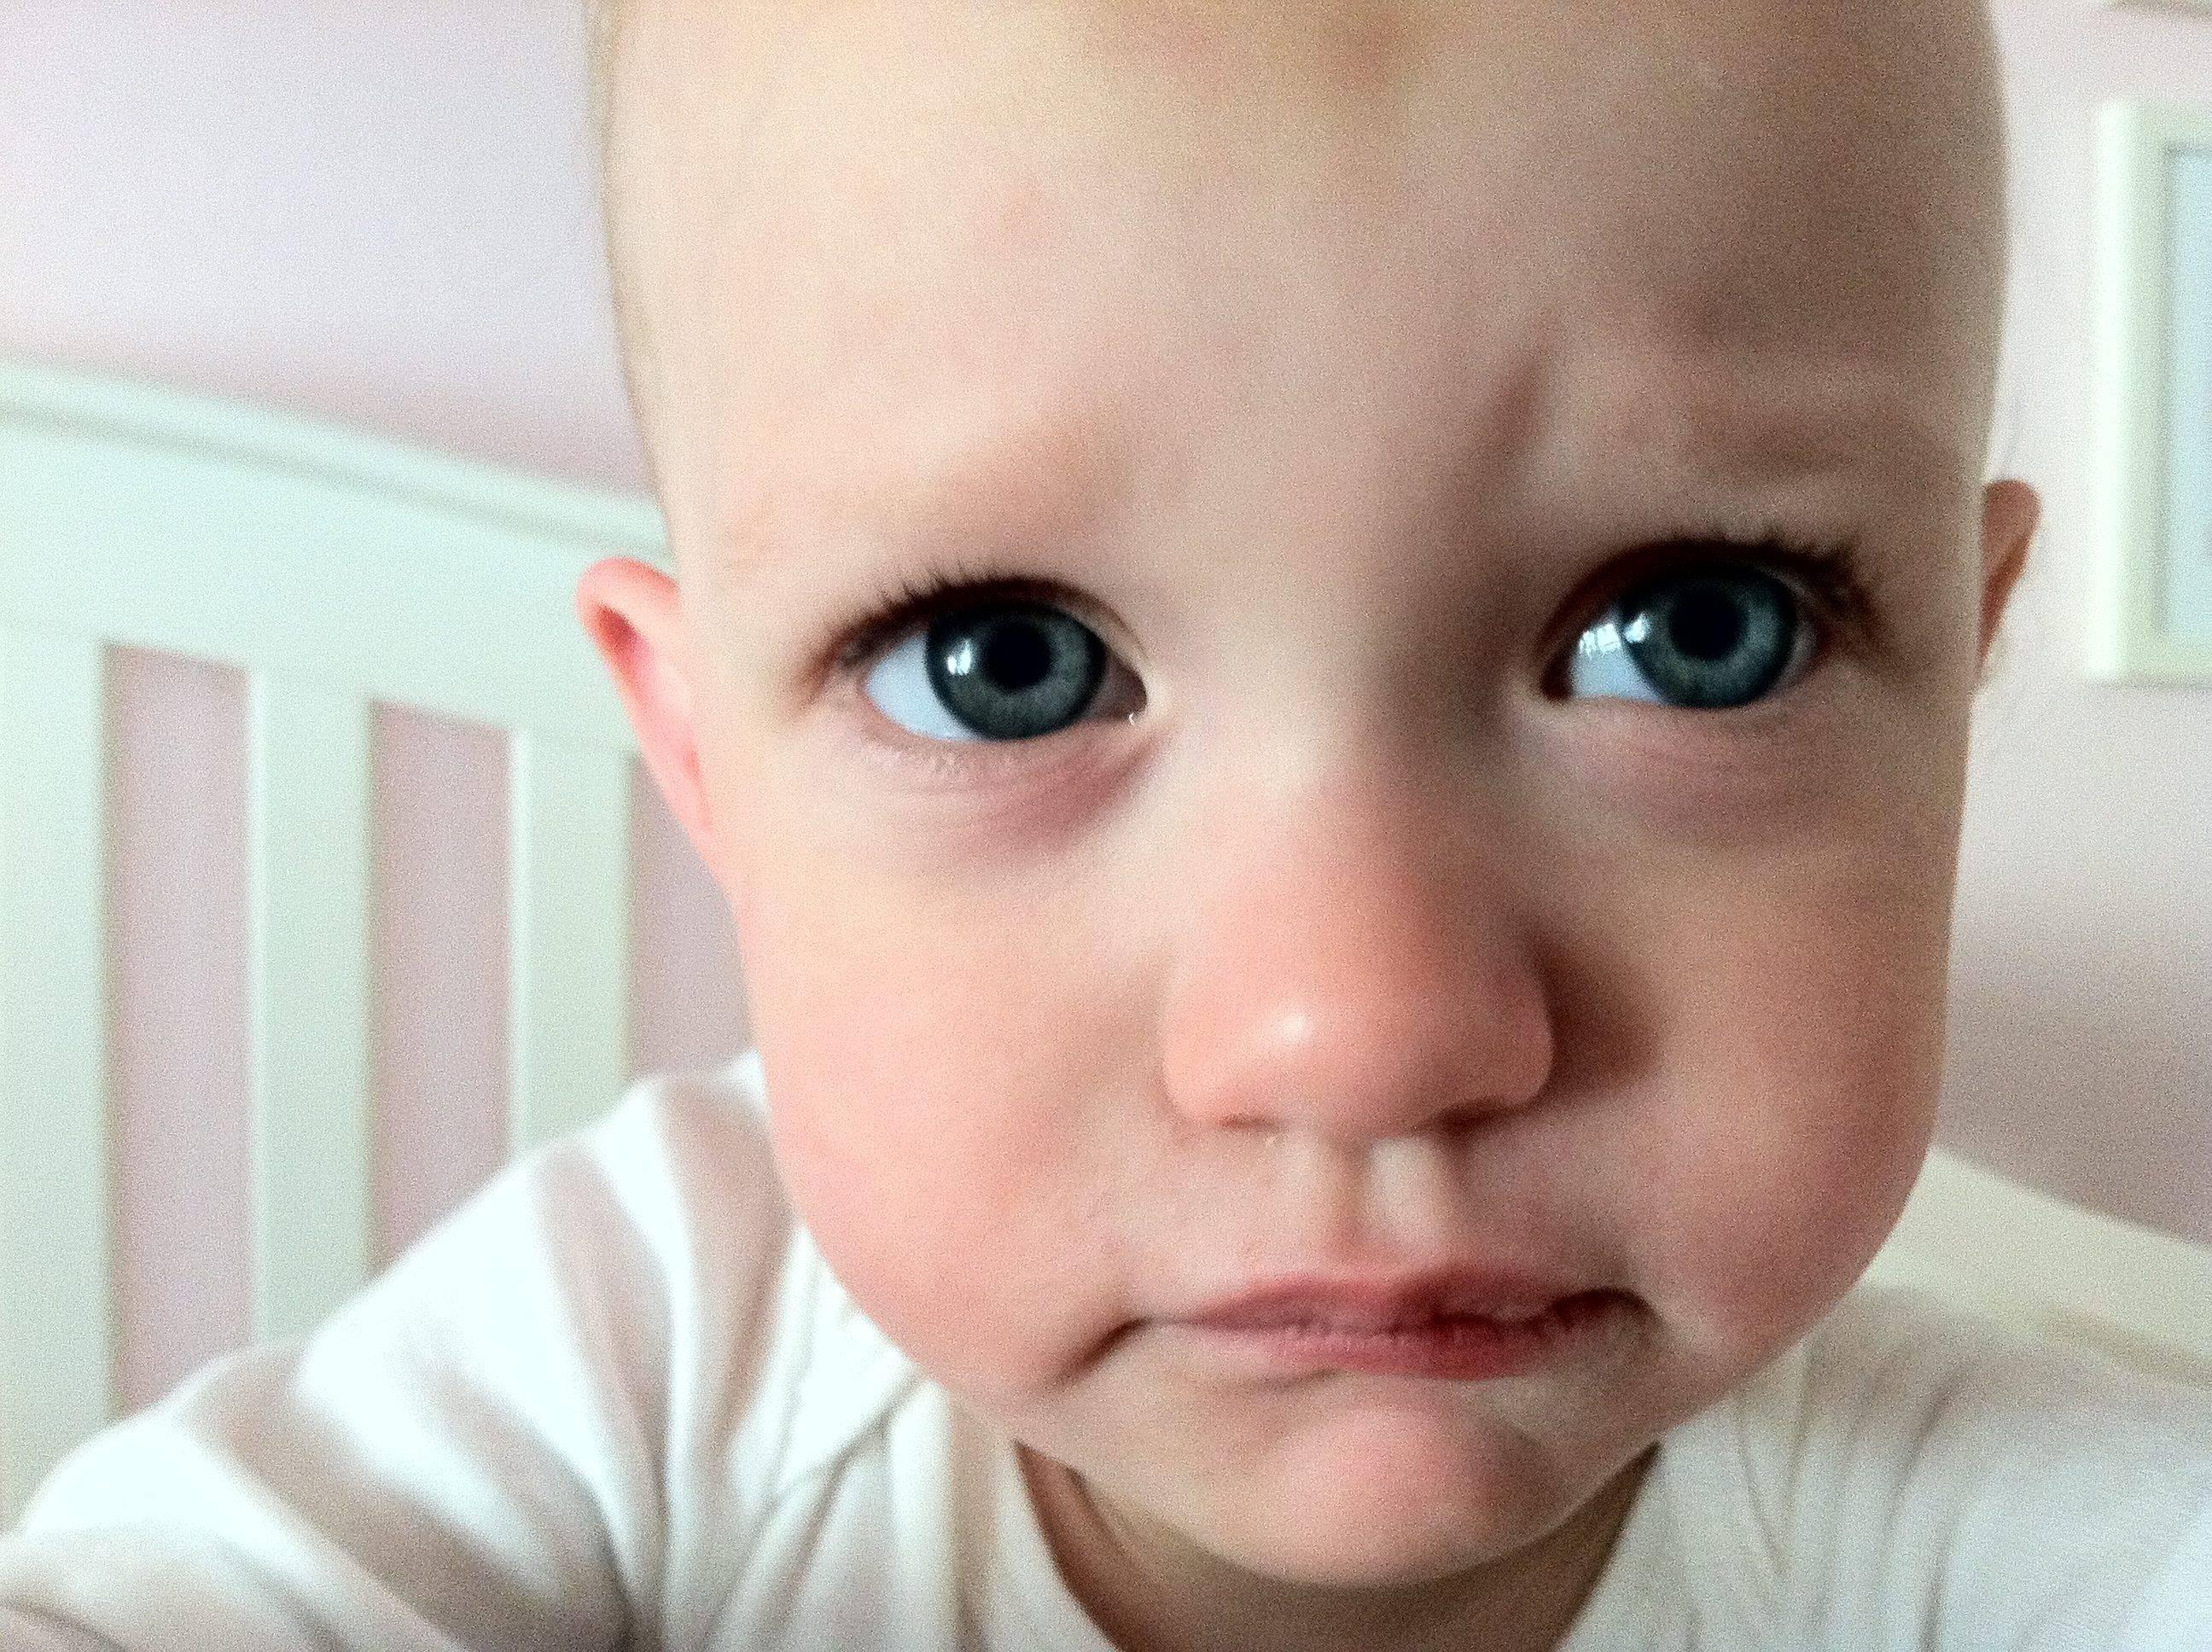 синяк под глазом от удара у ребенка